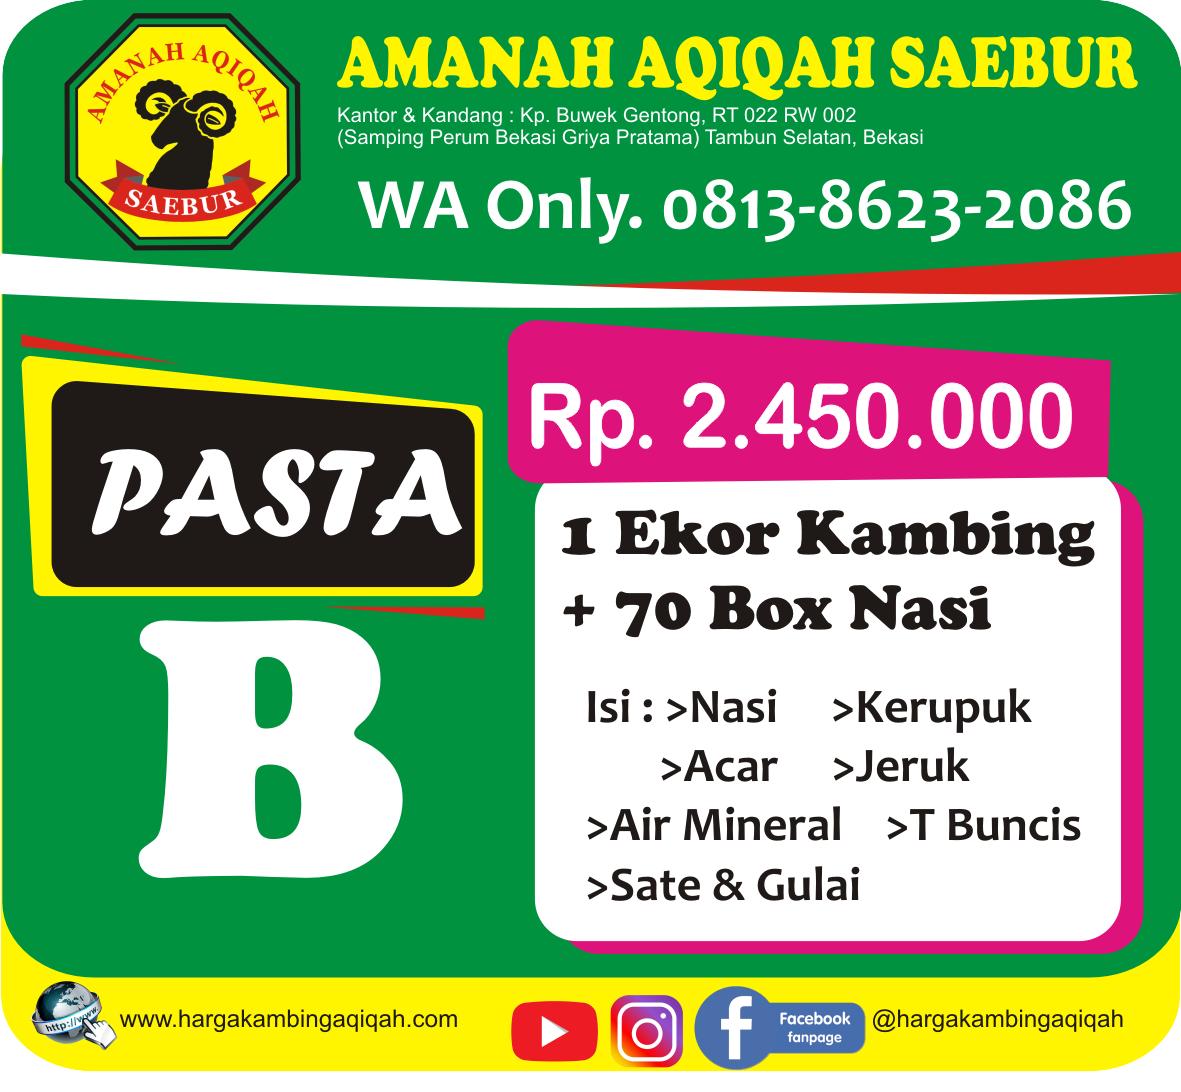 aqiqah anak laki, aqiqah anak laki laki, aqiqah anak perempuan, aqiqah murah Bekasi, harga aqiqah di Bekasi, harga aqiqah di Jakarta, harga kambing aqiqah